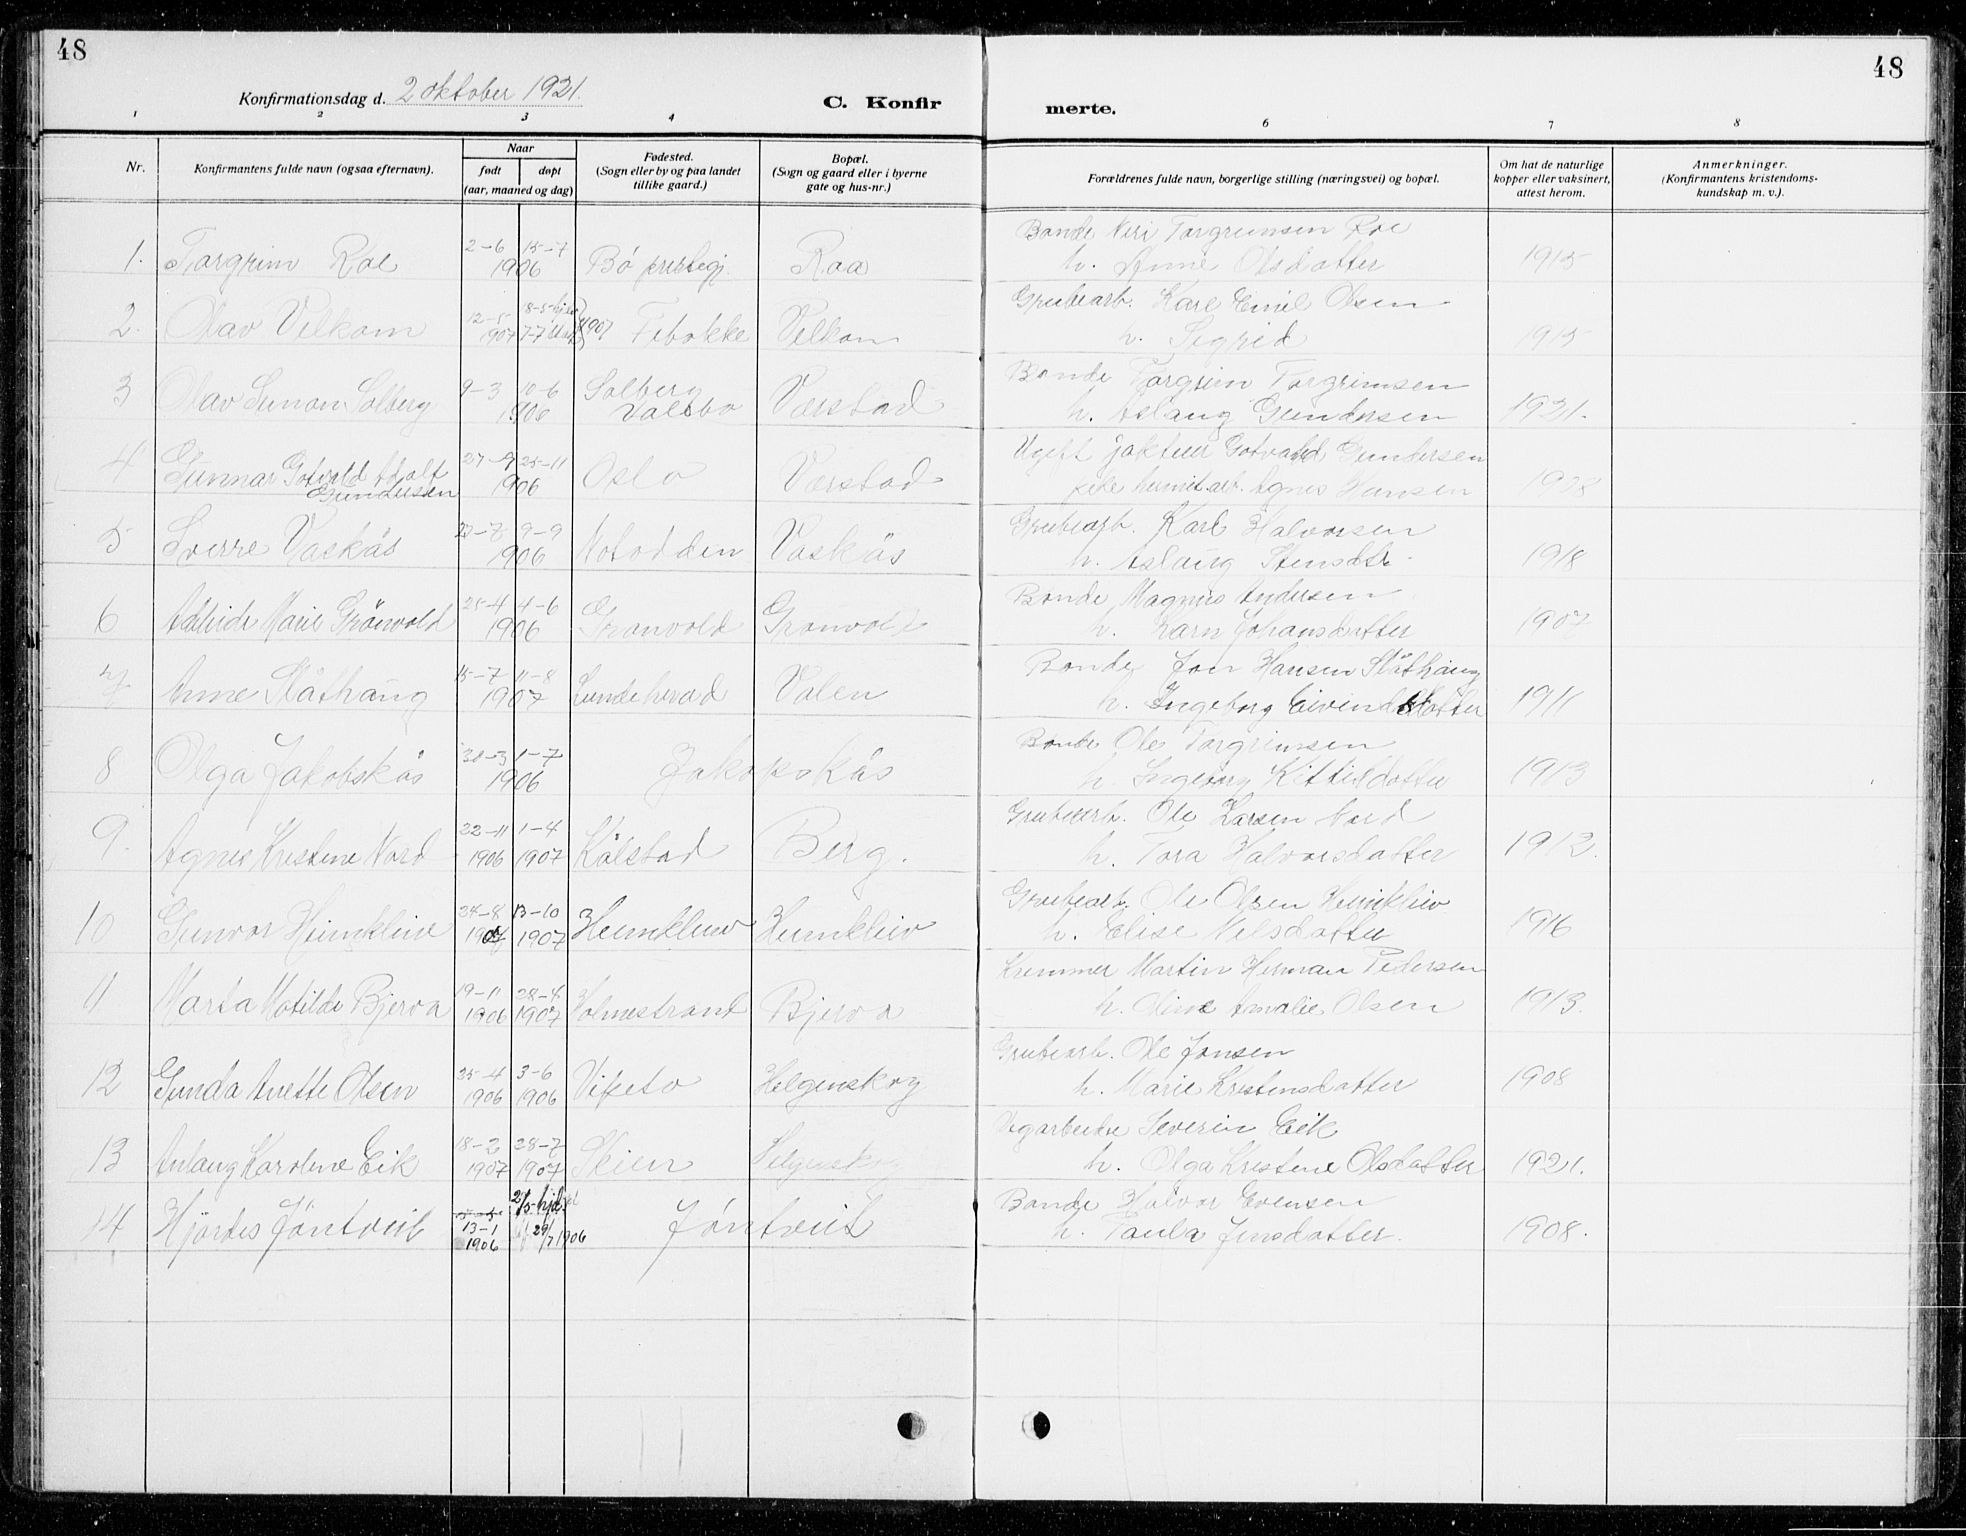 SAKO, Holla kirkebøker, G/Gb/L0003: Klokkerbok nr. II 3, 1914-1941, s. 48